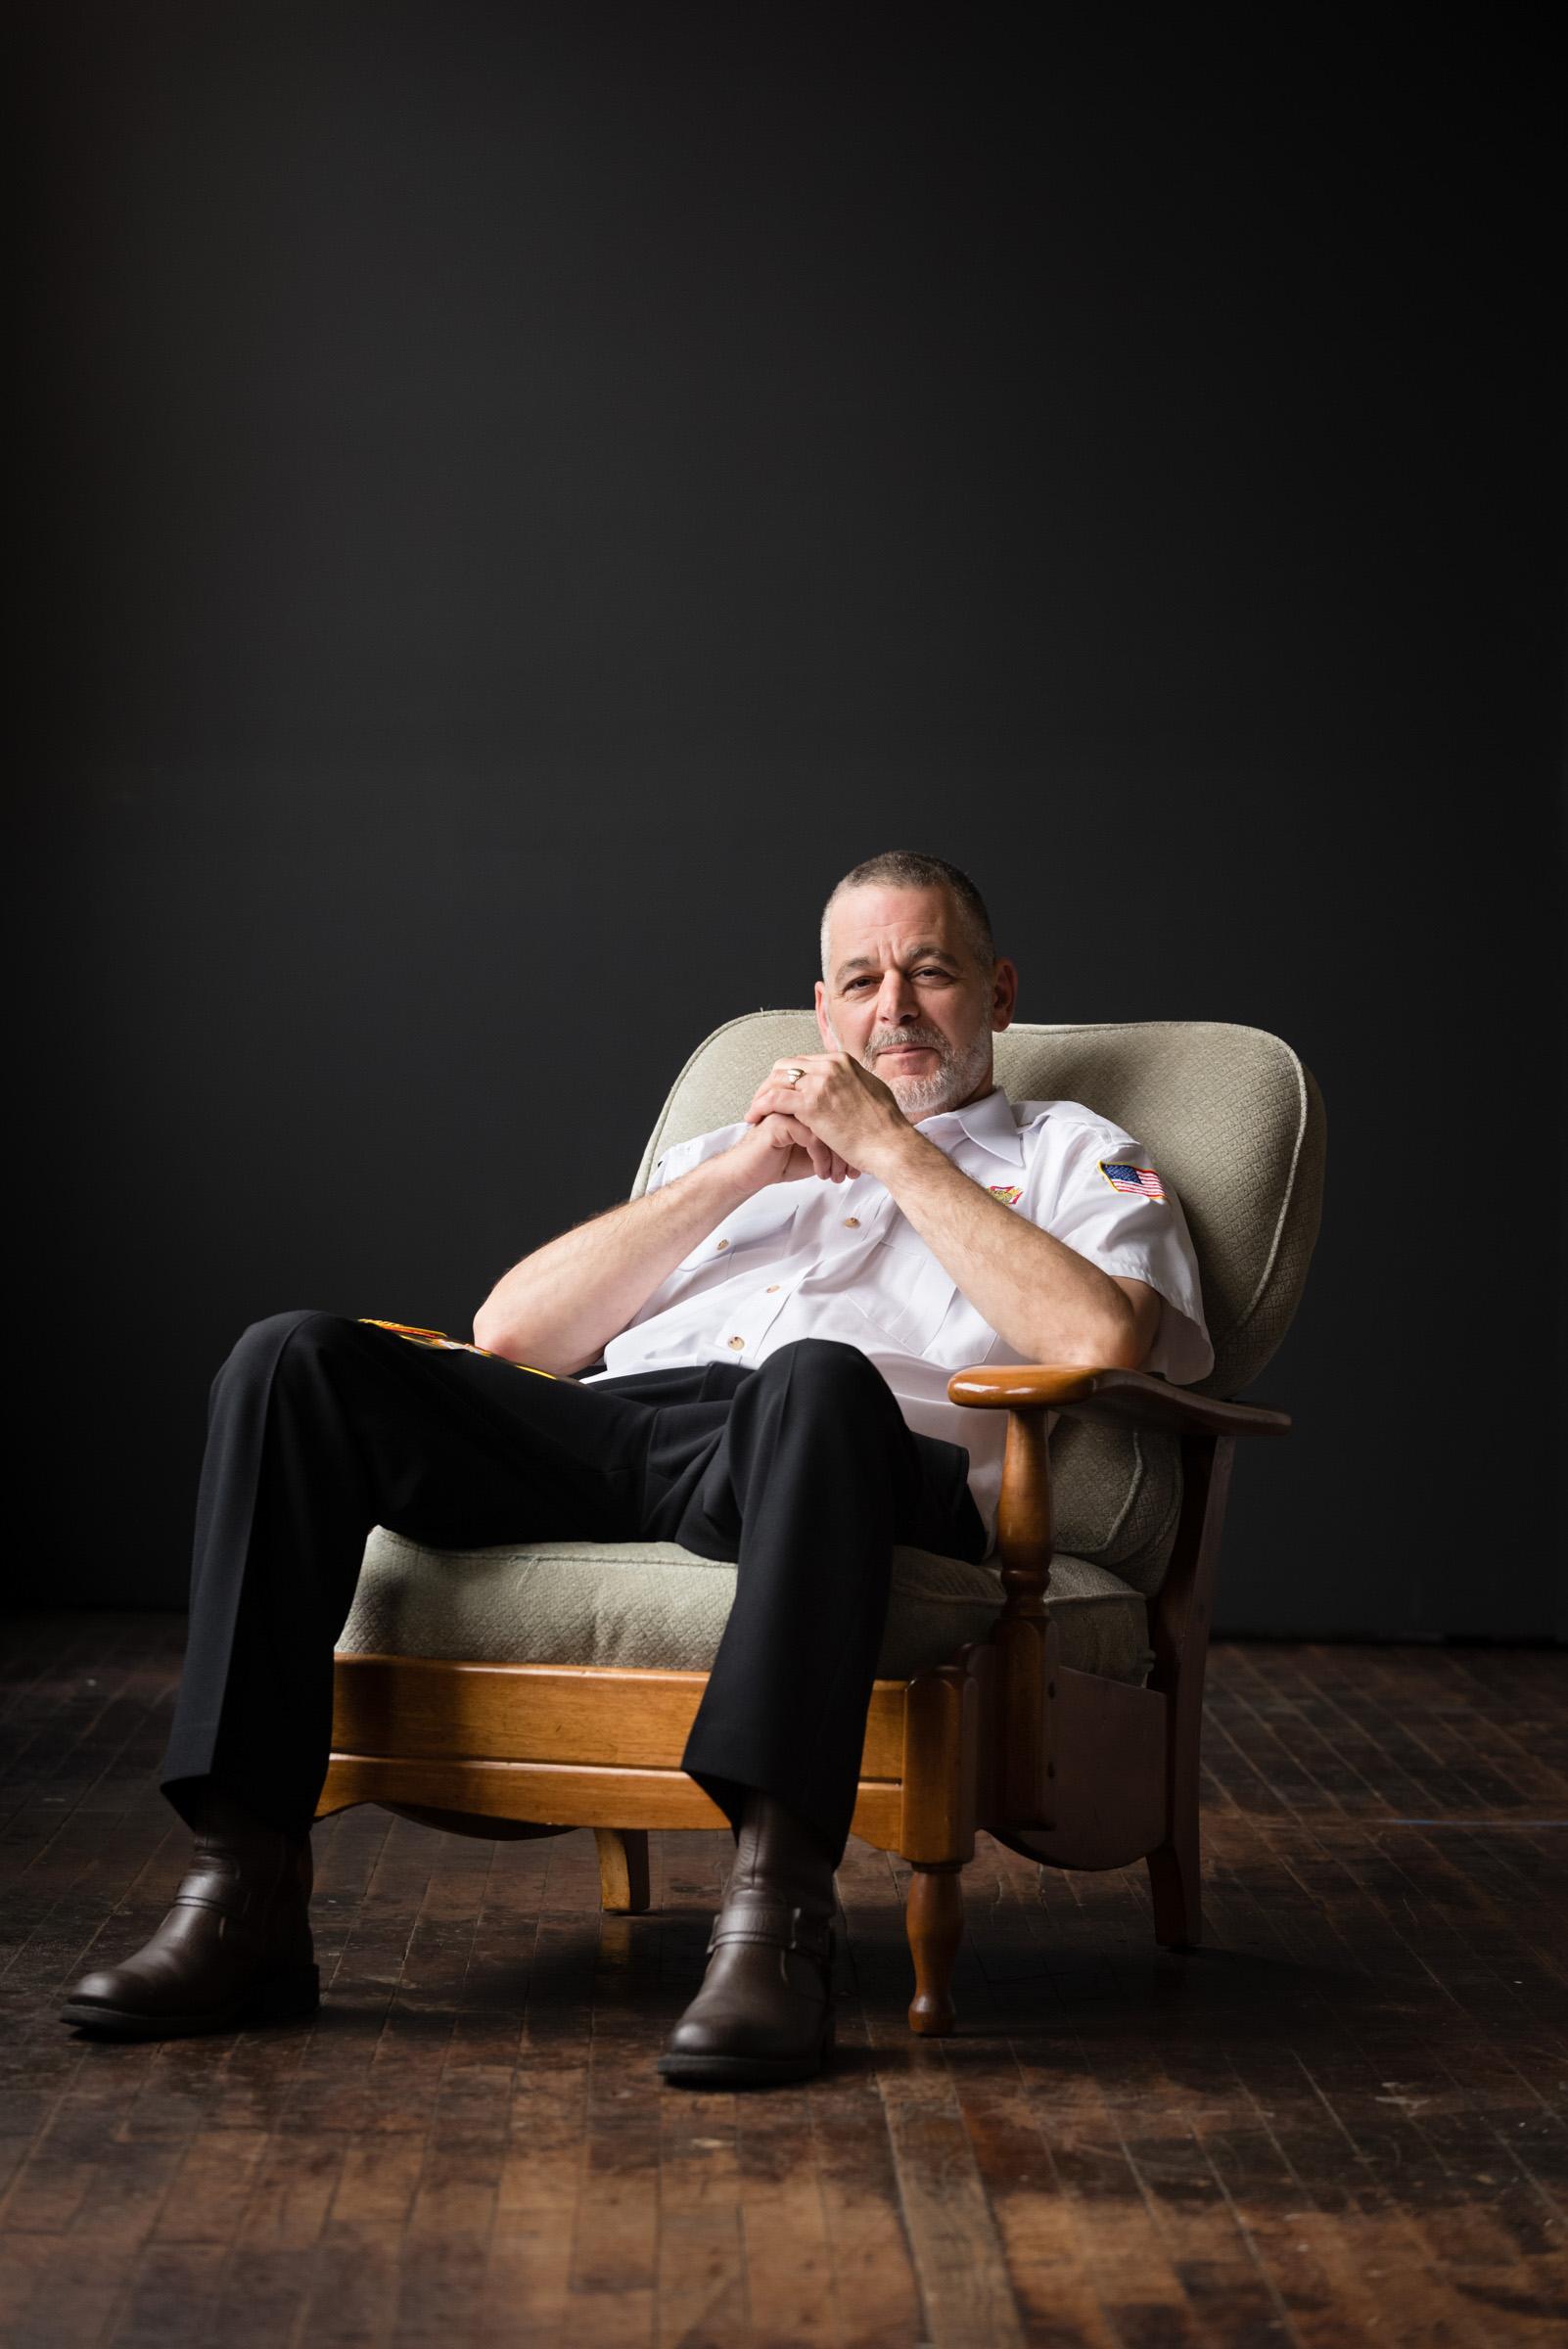 Cleveland-Portrait-Photographer-Angelo-Merendino139.jpg